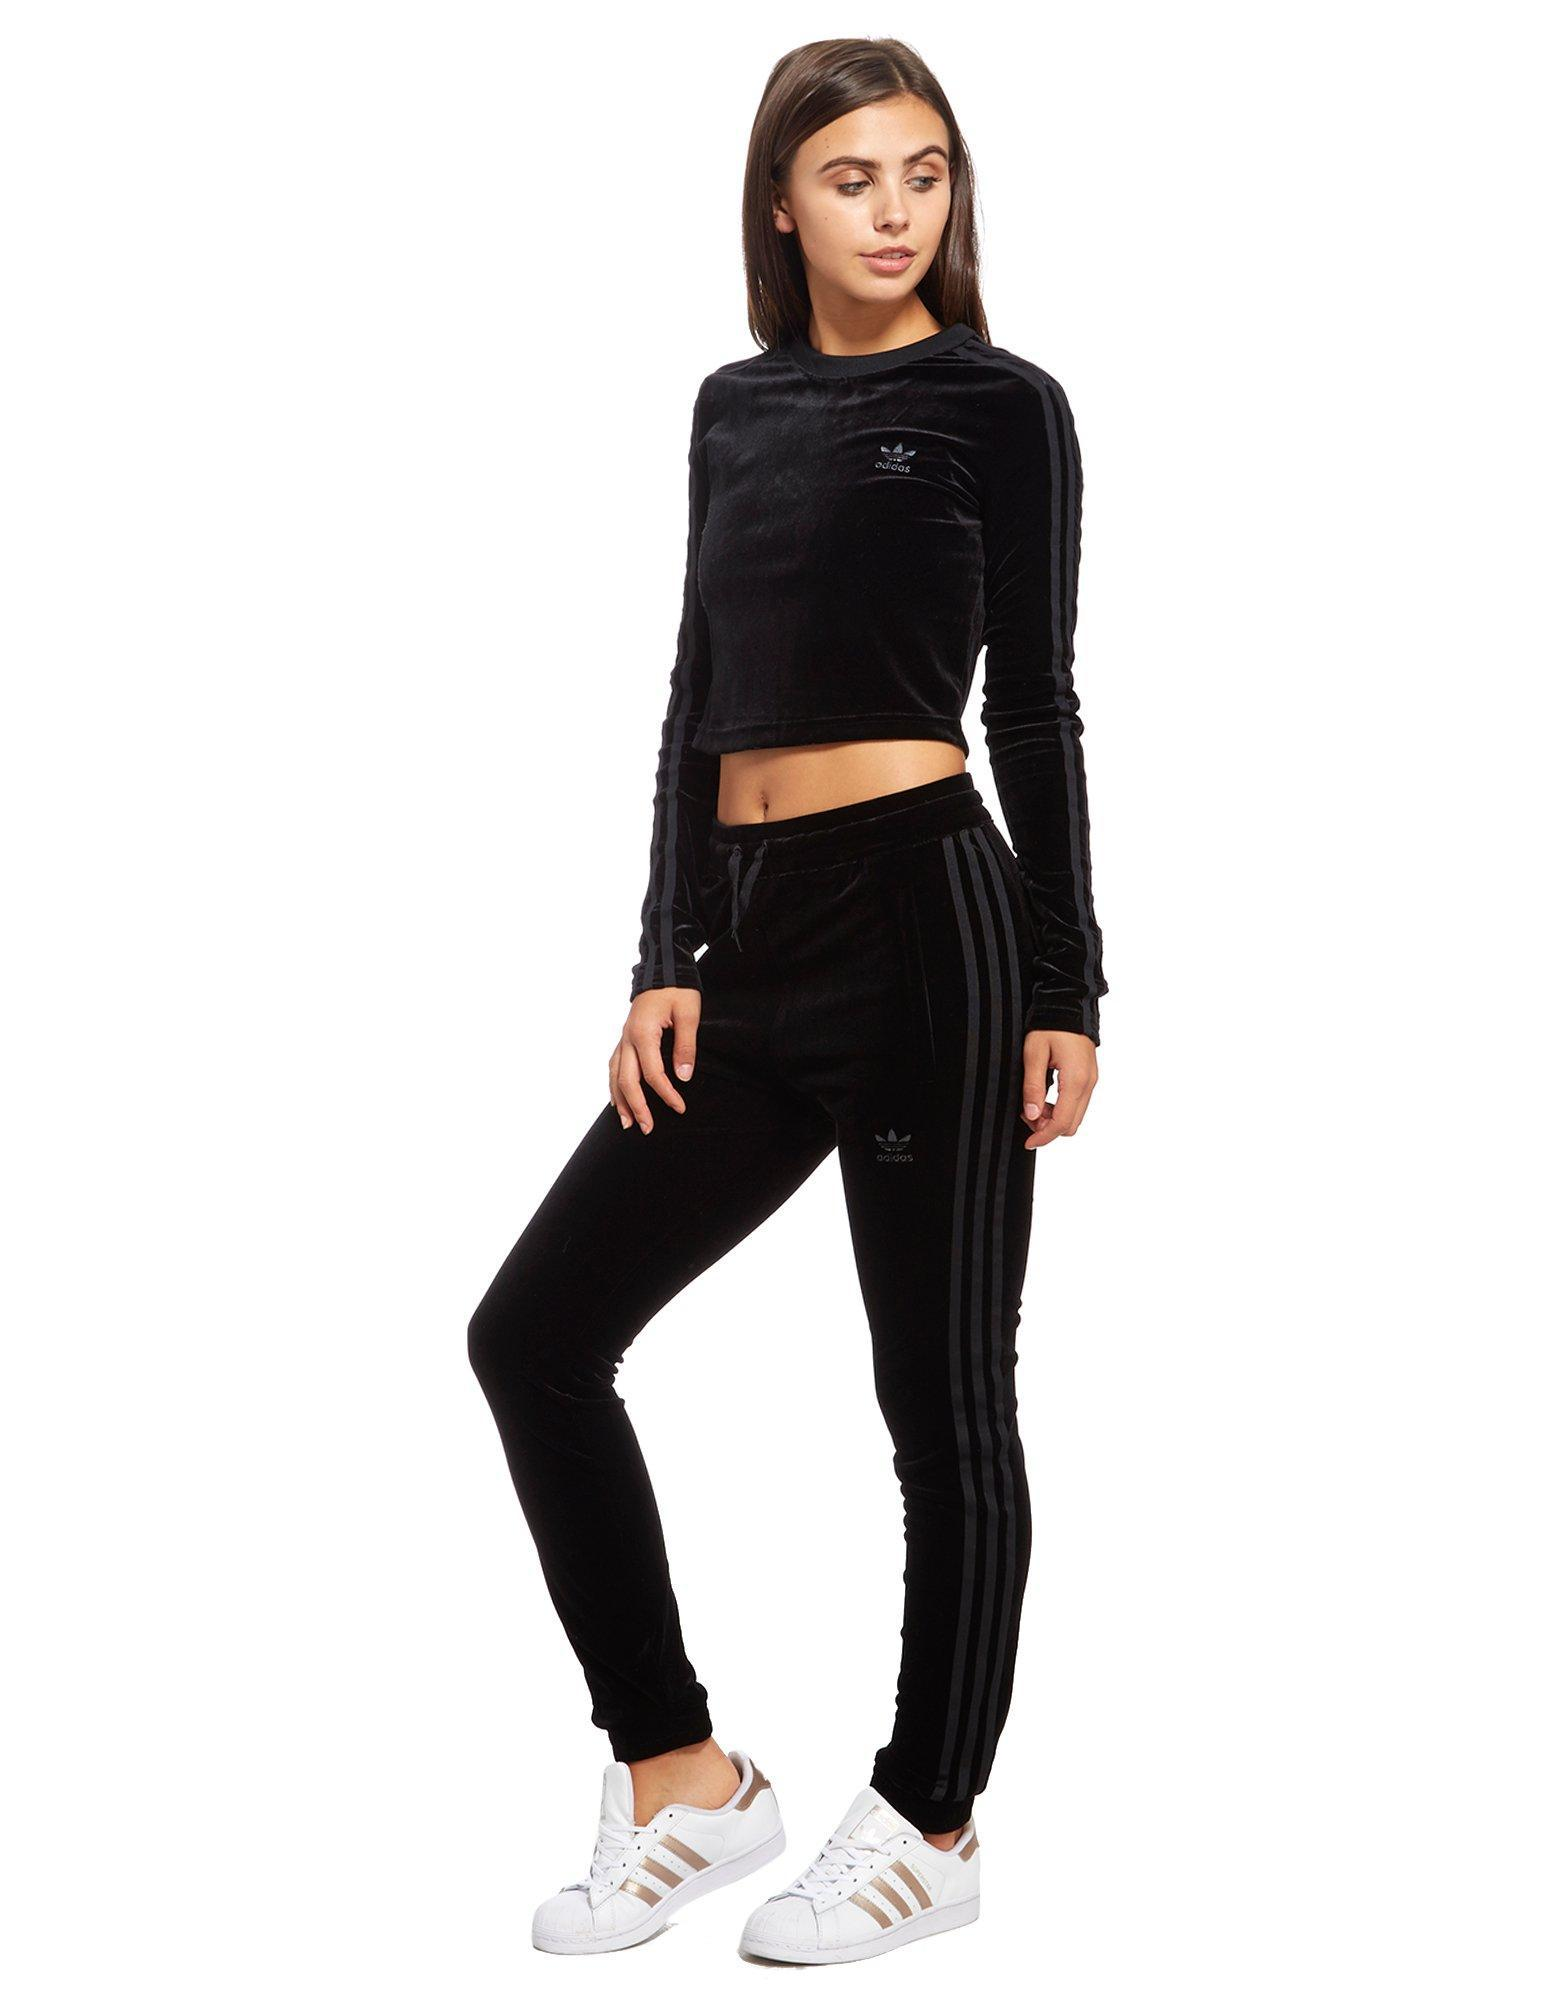 806f09e94 adidas Originals Velvet Vibes Long Sleeve Crop Top in Black - Lyst